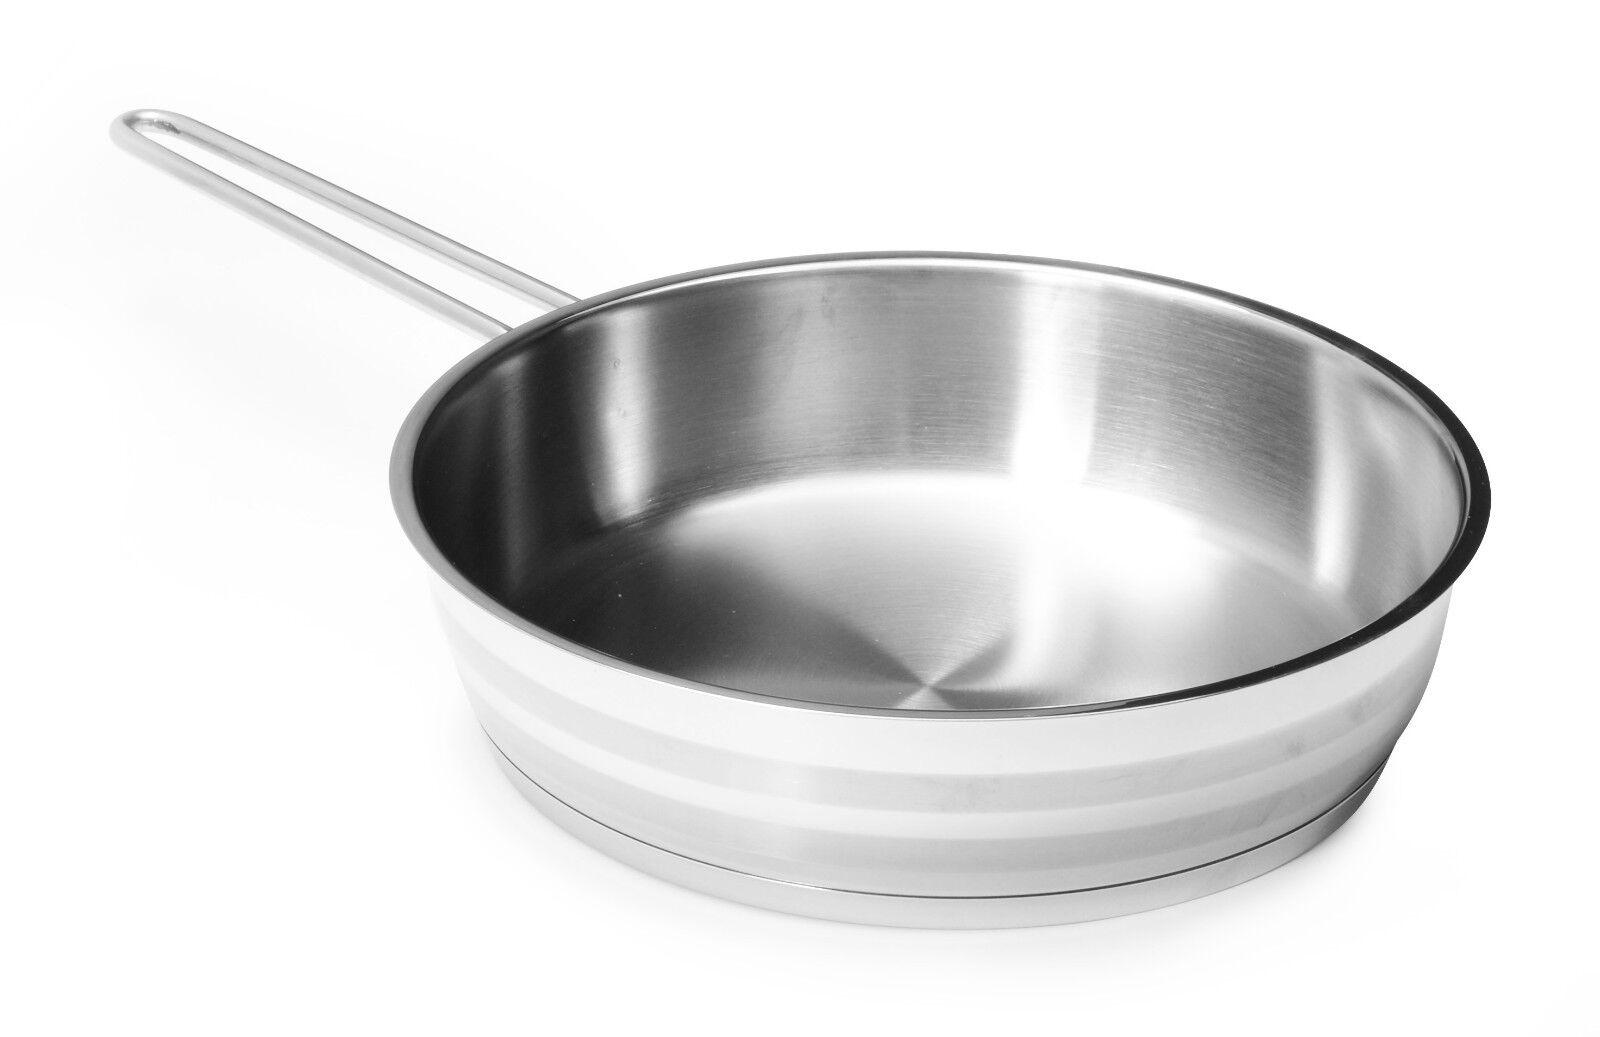 Korkmaz Stainless Steel Frying pan